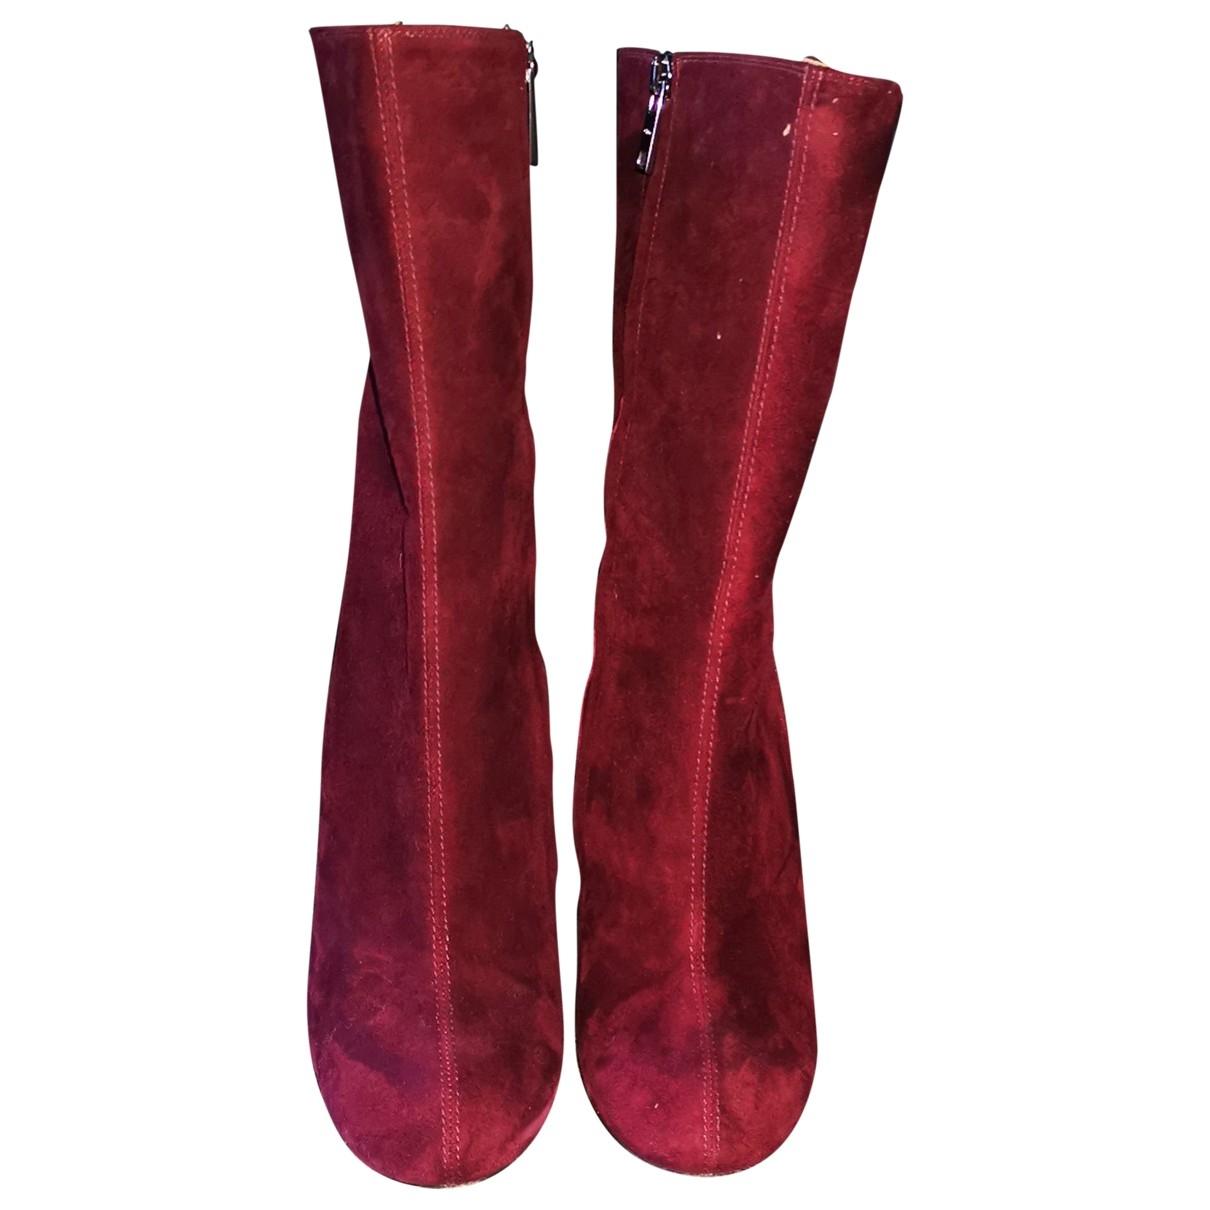 Chloé \N Burgundy Suede Boots for Women 40 EU